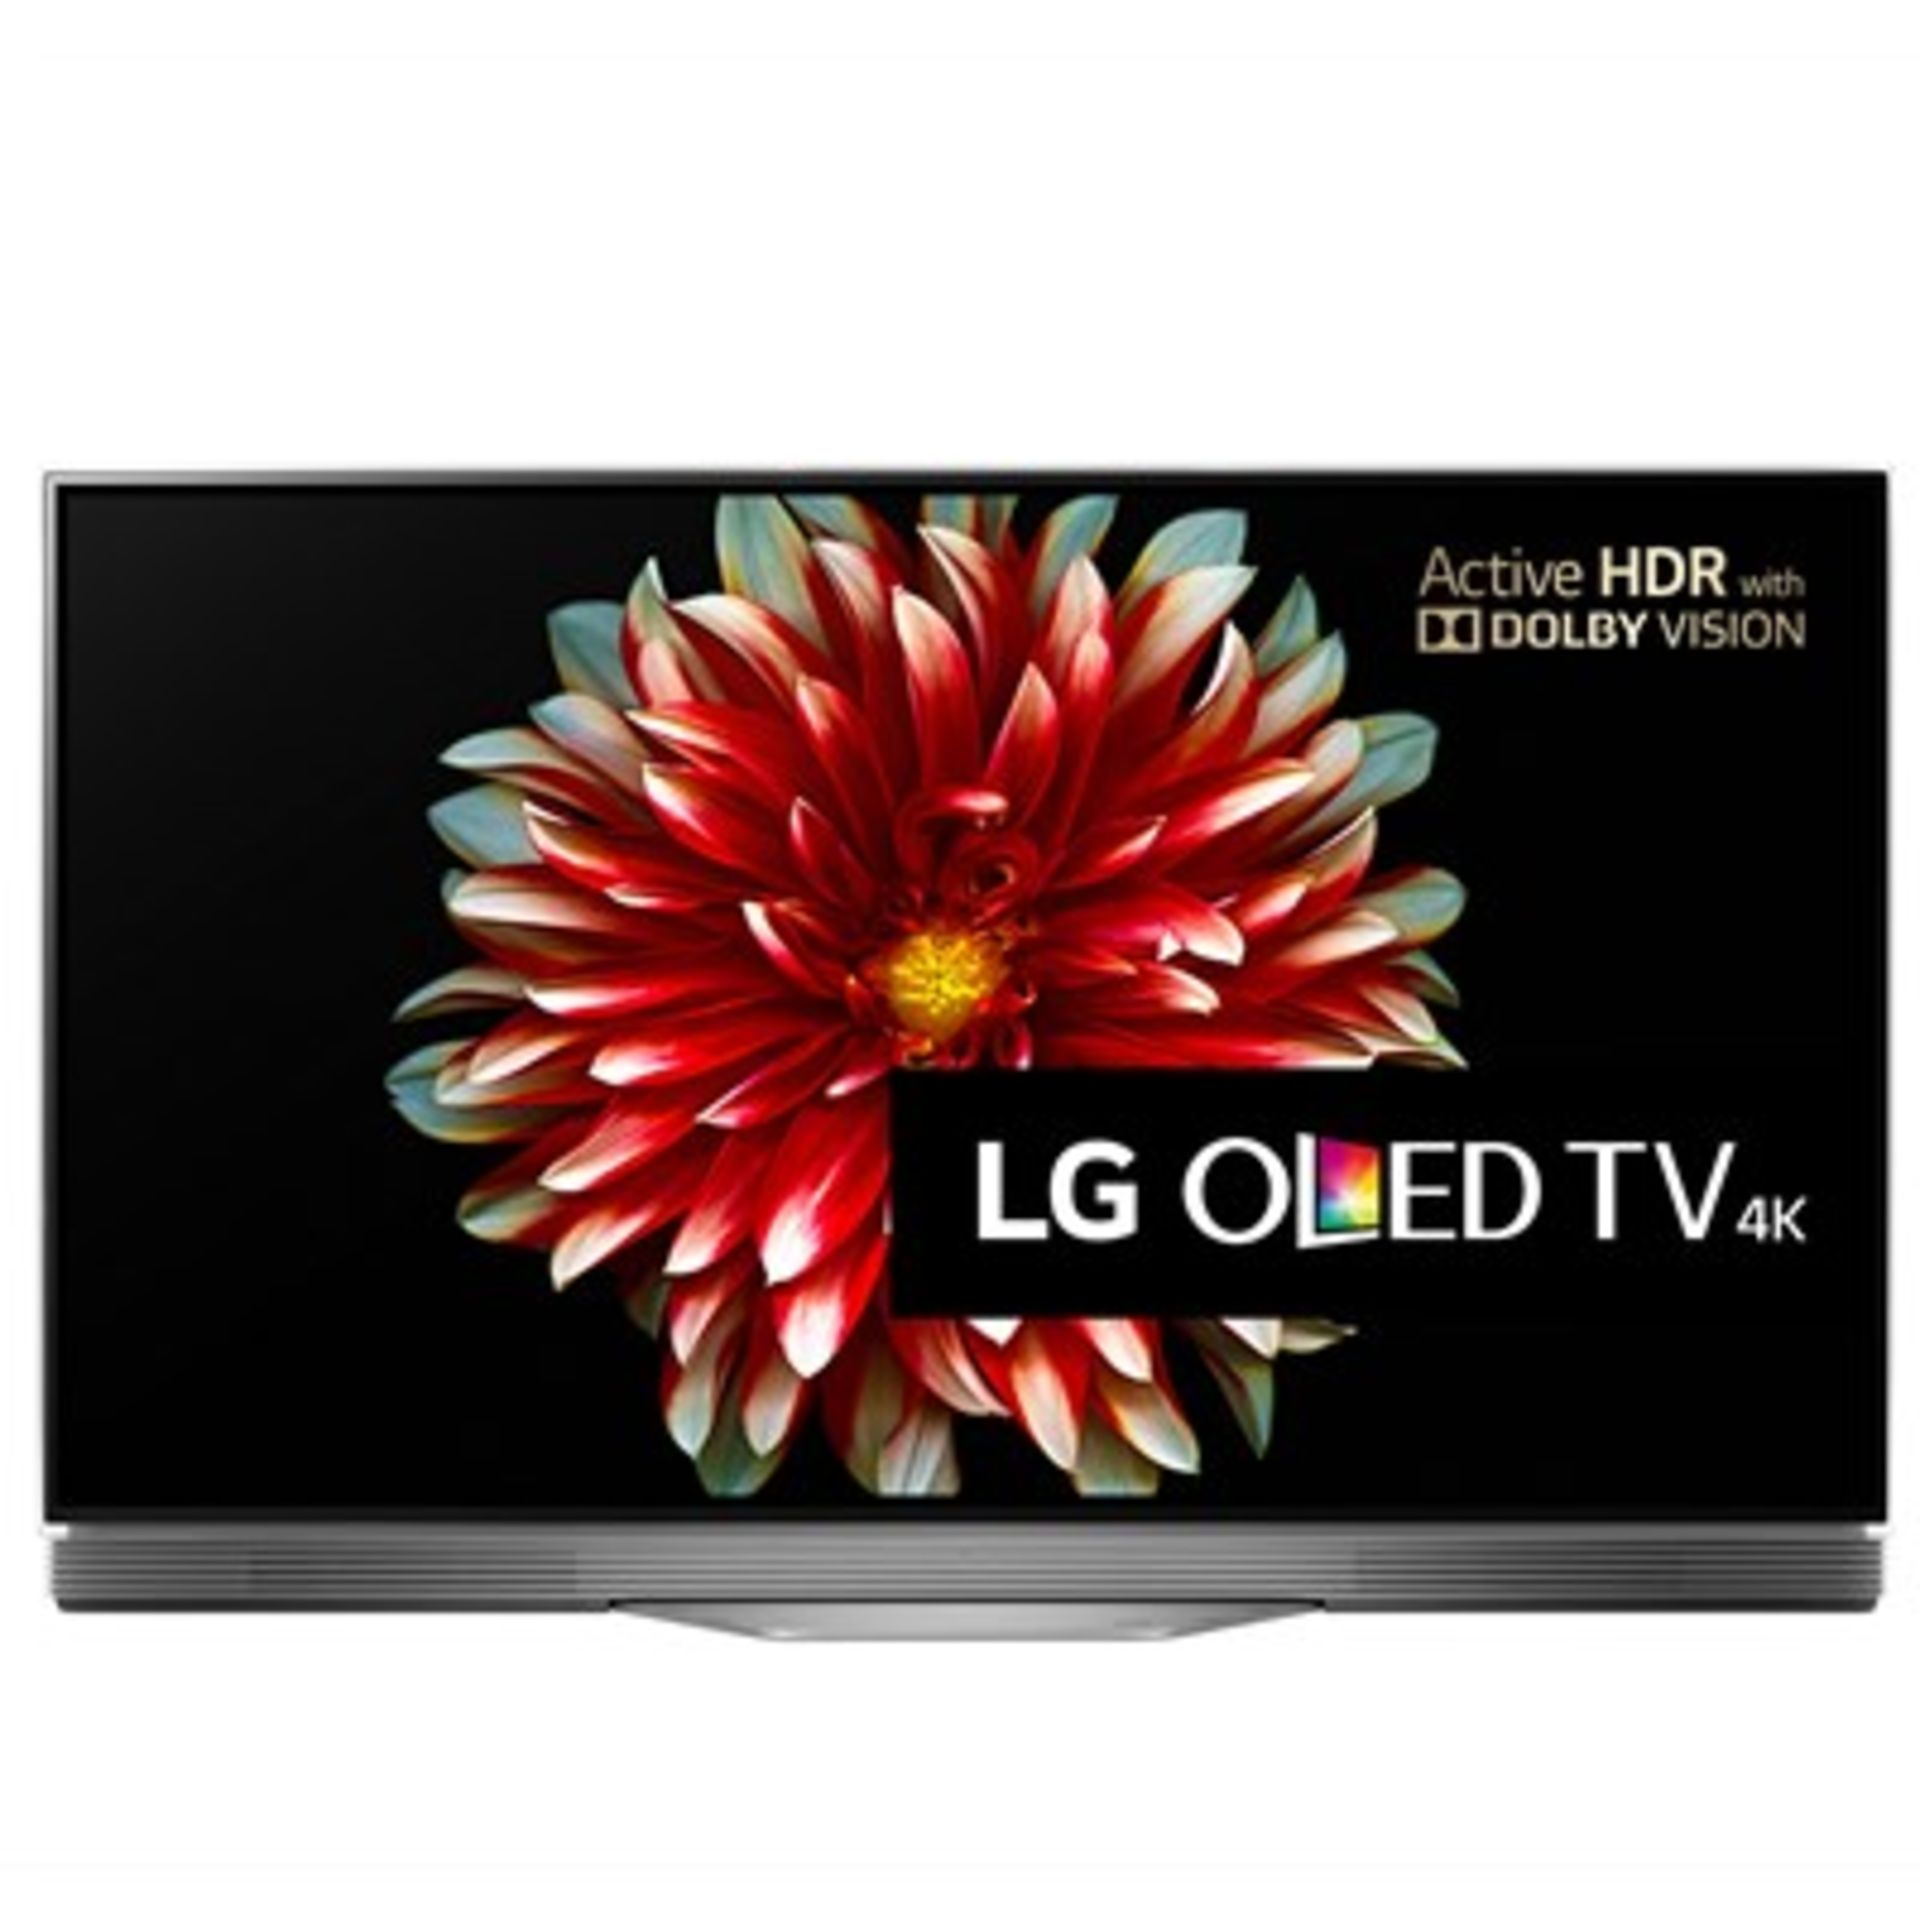 + VAT Grade A LG LG SIGNATURE E RANGE - 55 Inch FLAT OLED HDR 4K ULTRA HD SMART TV WITH FREEVIEW HD